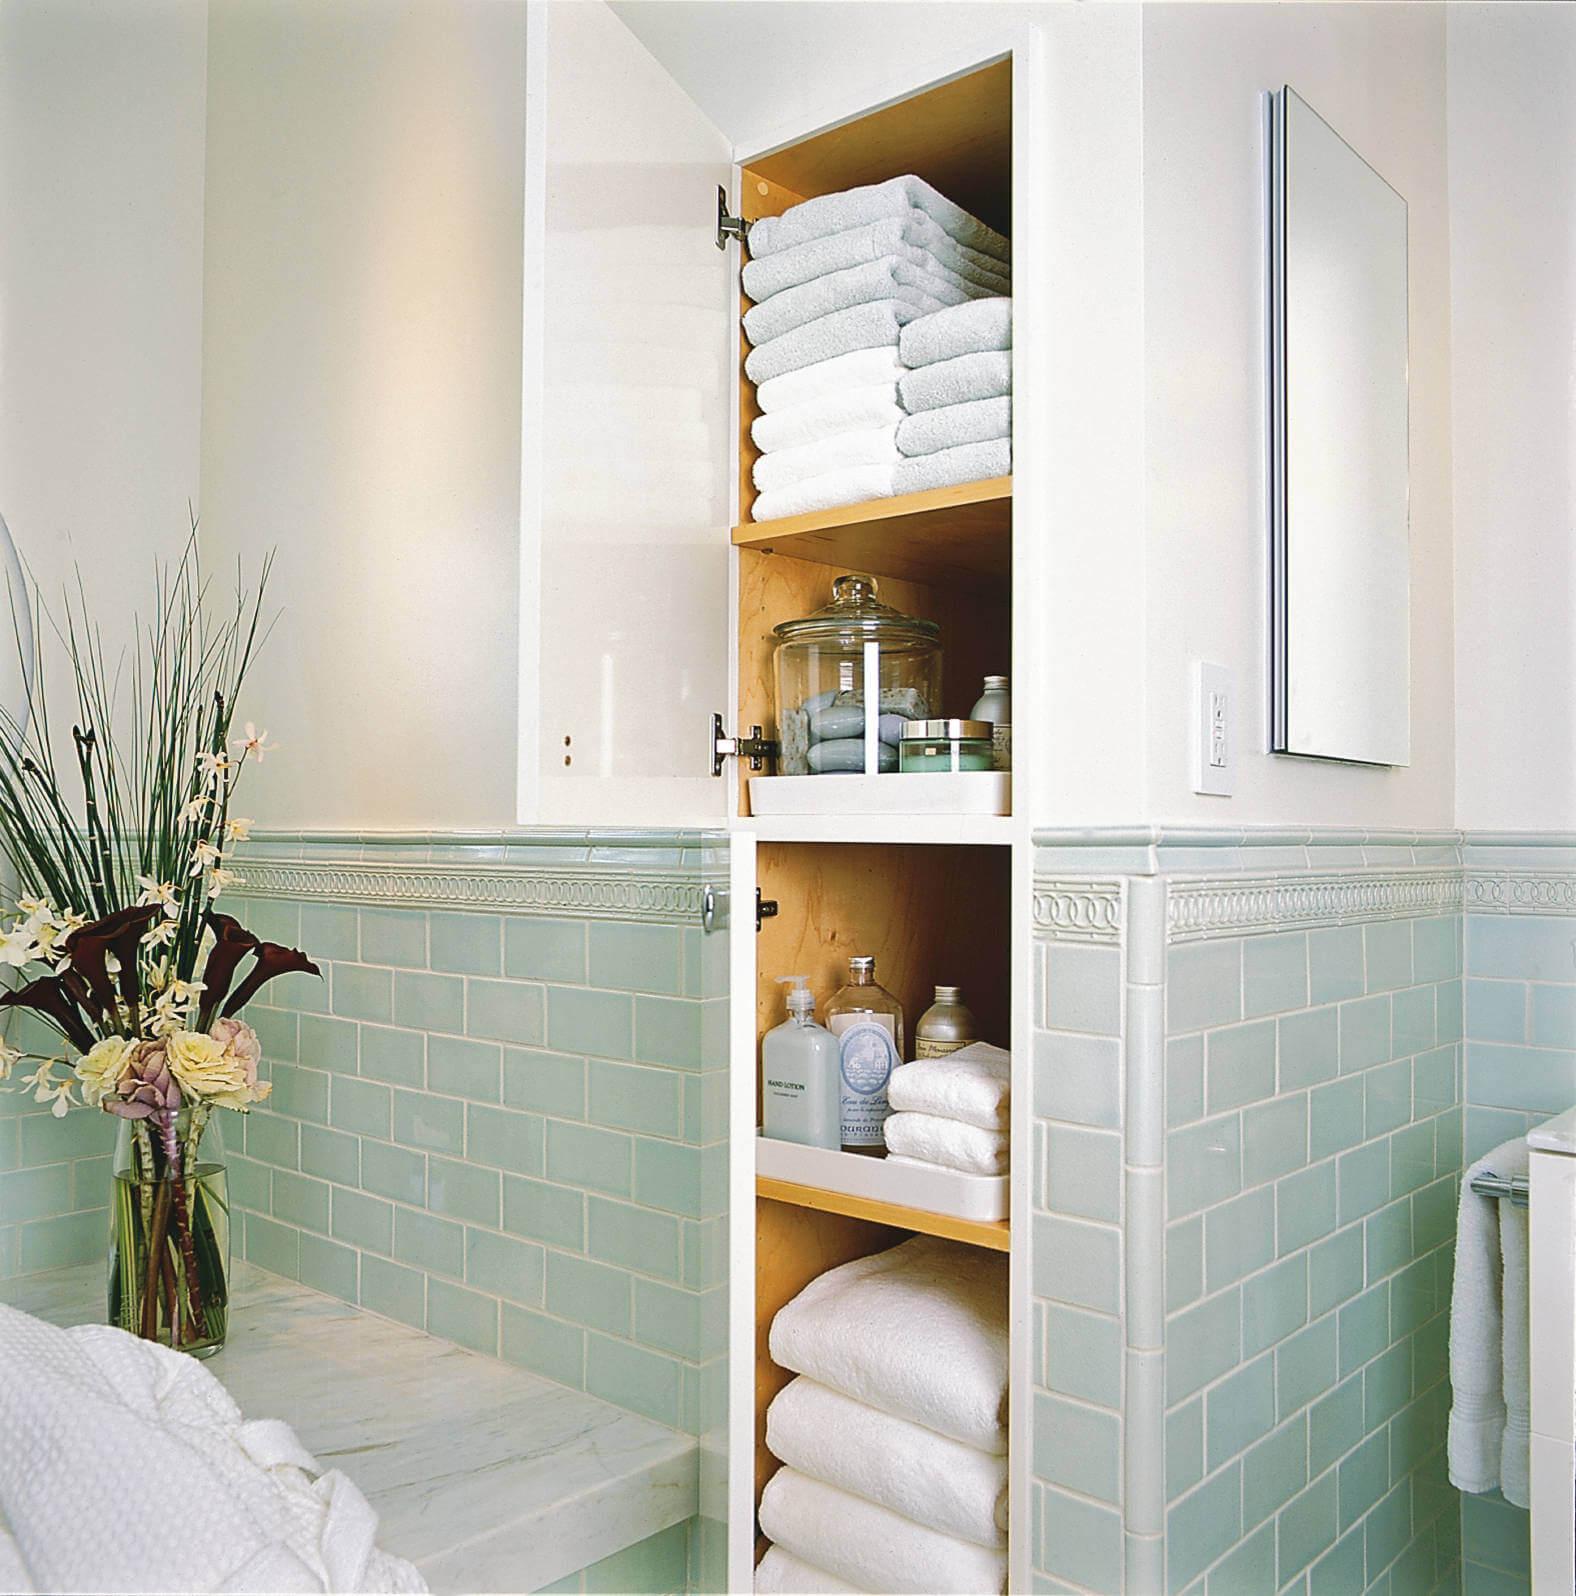 37 Best Towel Storage Ideas And Designs For 2019 Top regarding measurements 1576 X 1596